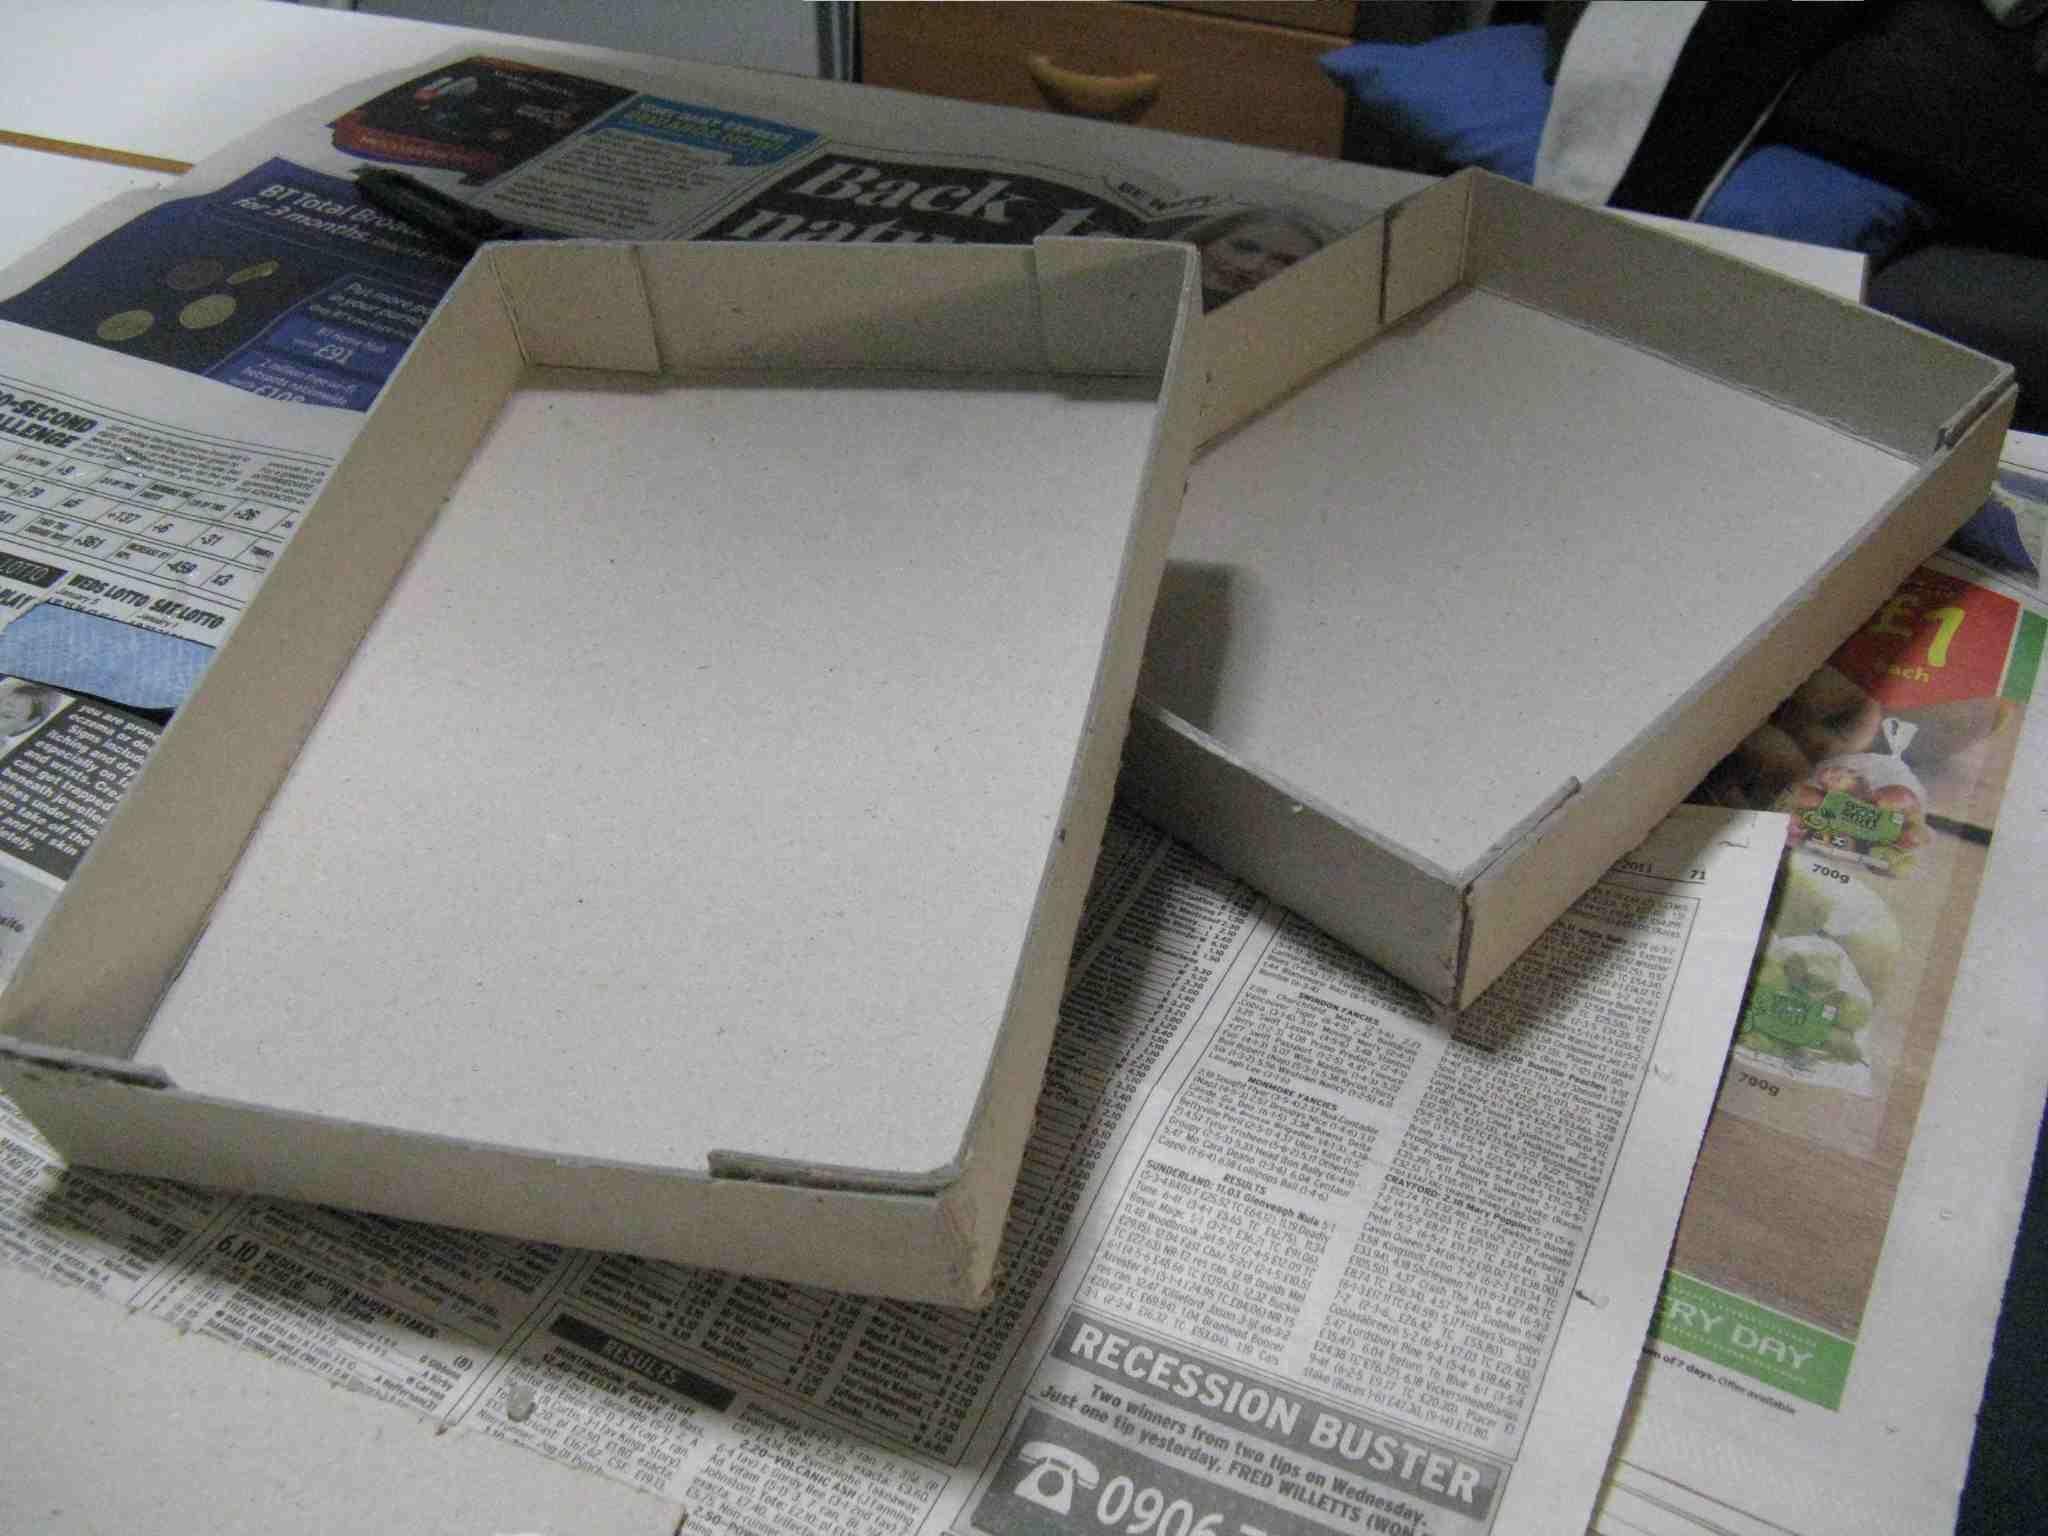 How to make a cardboard box cardboard boxes template - Como hacer una caja de carton ...